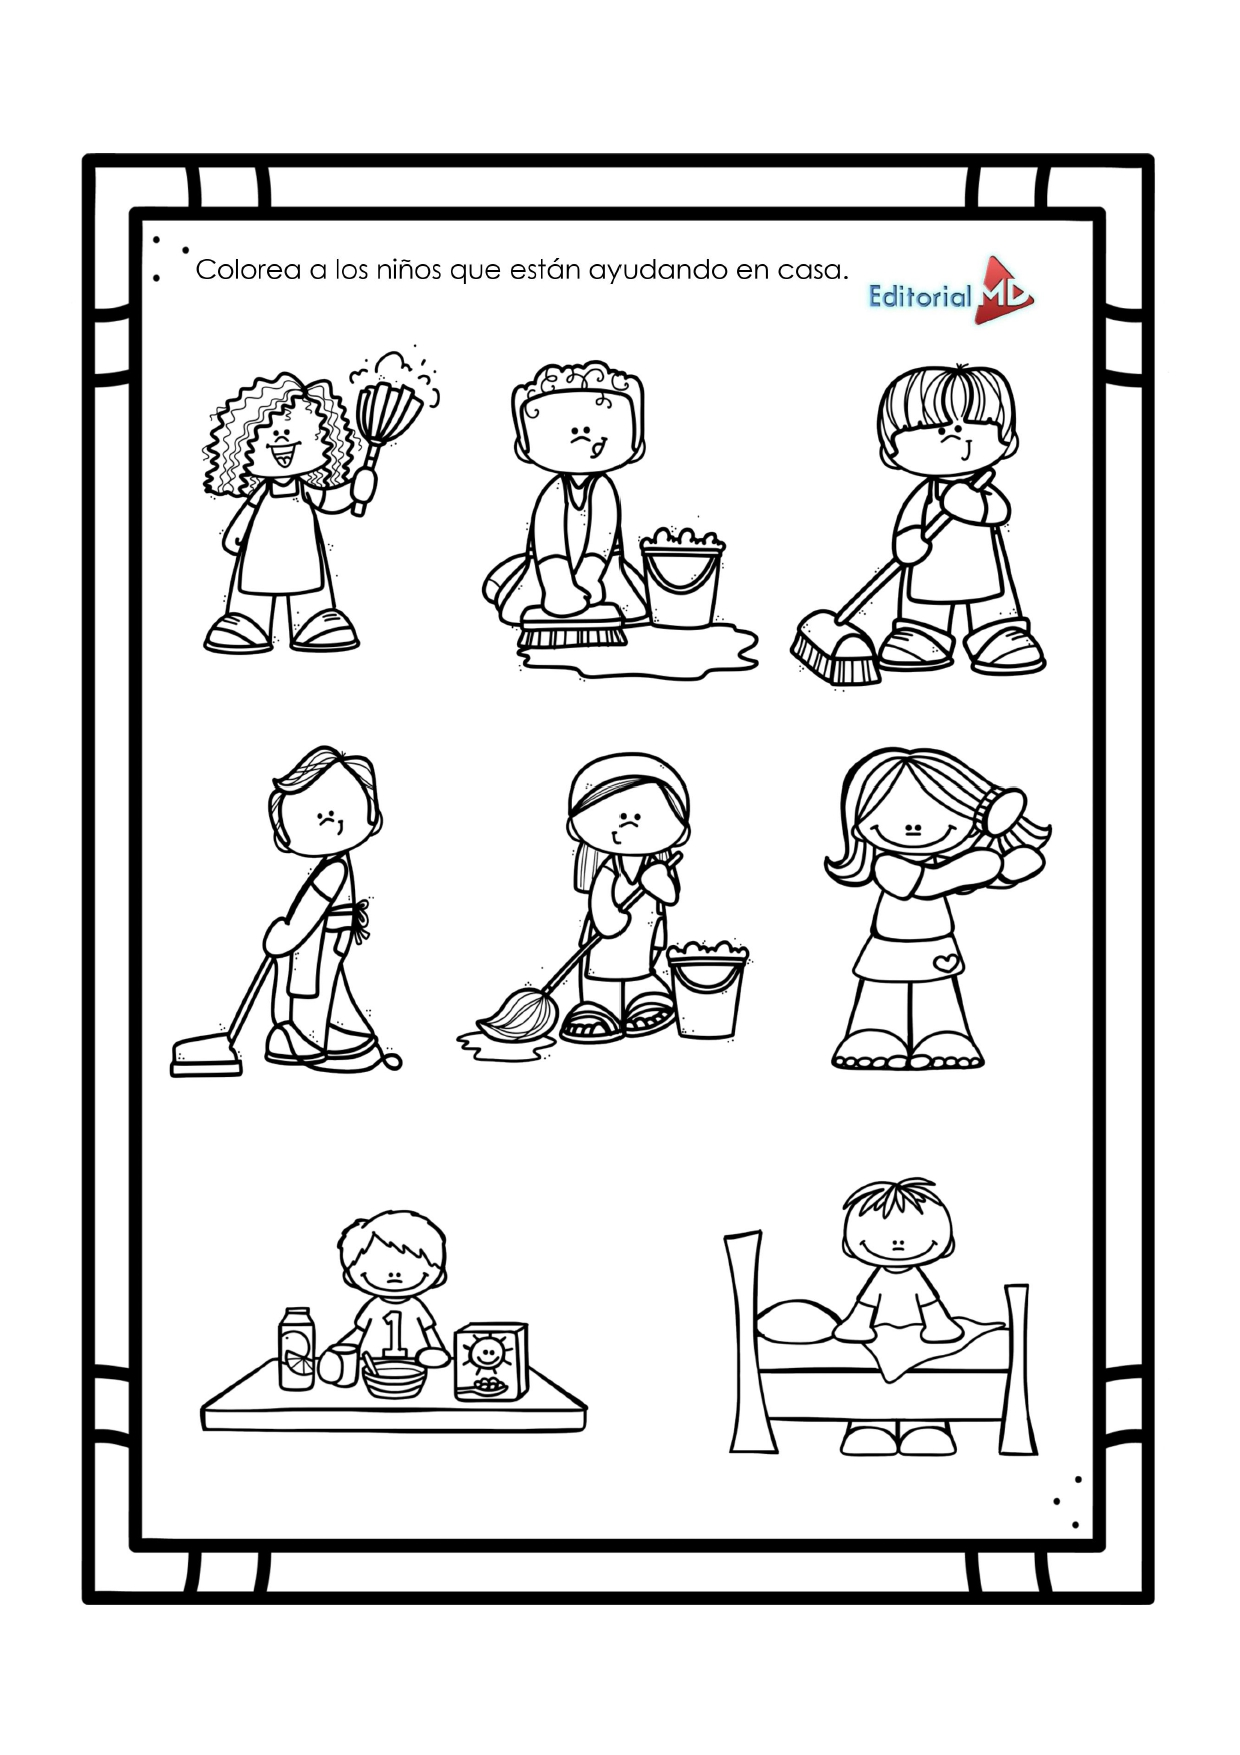 Ejemplo Material de apoyo semana 16 preescolar 03